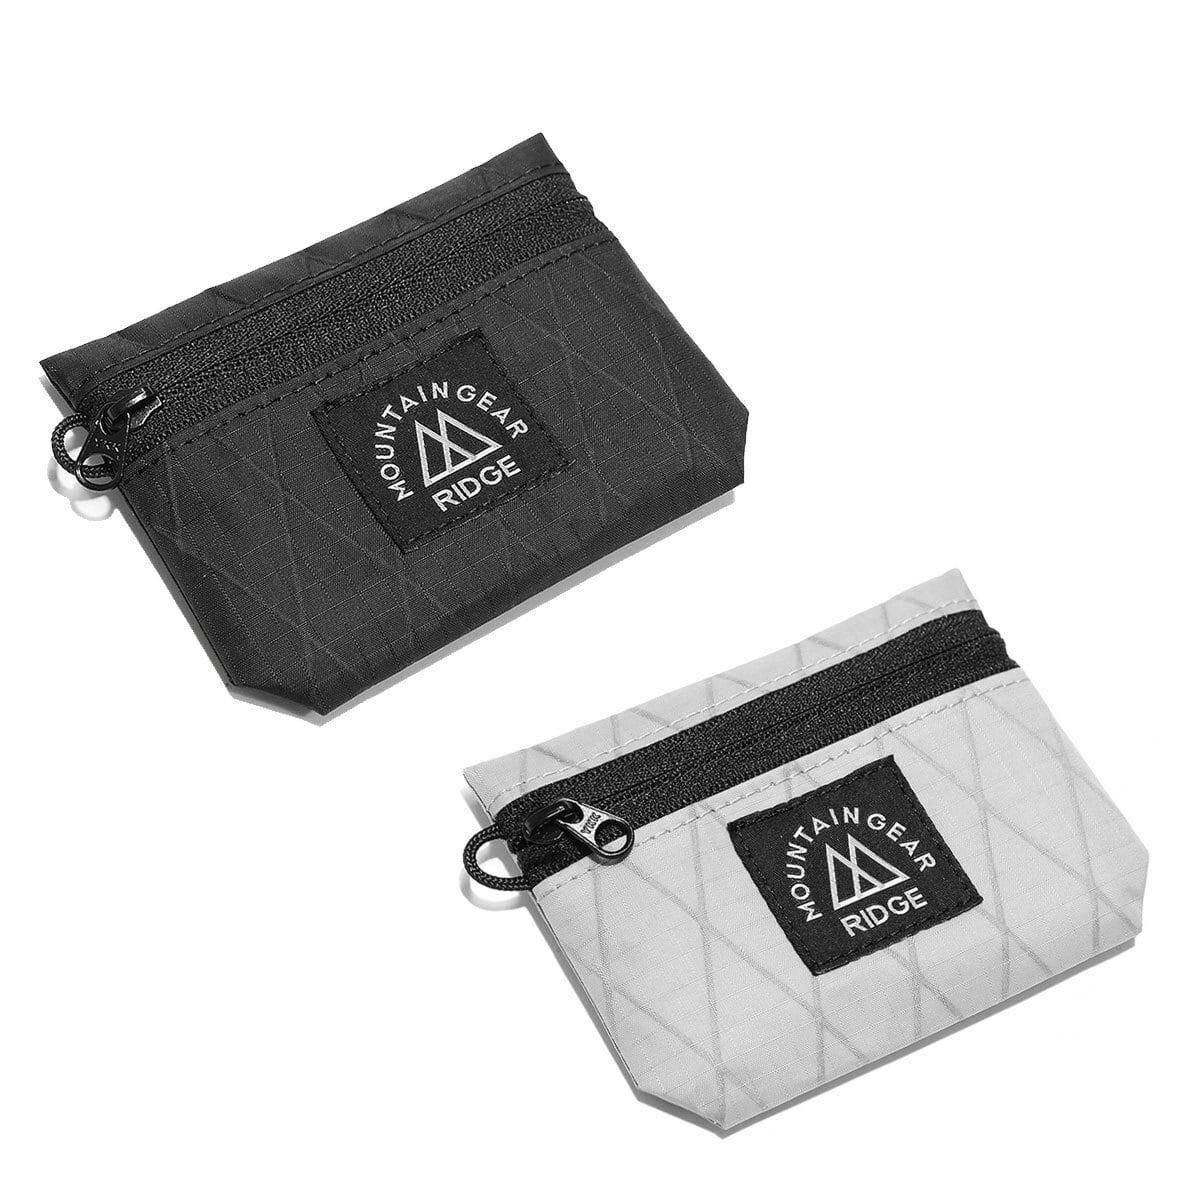 RIDGE MOUNTAIN GEAR(リッジマウンテンギア)Wallet X-Pac VX07